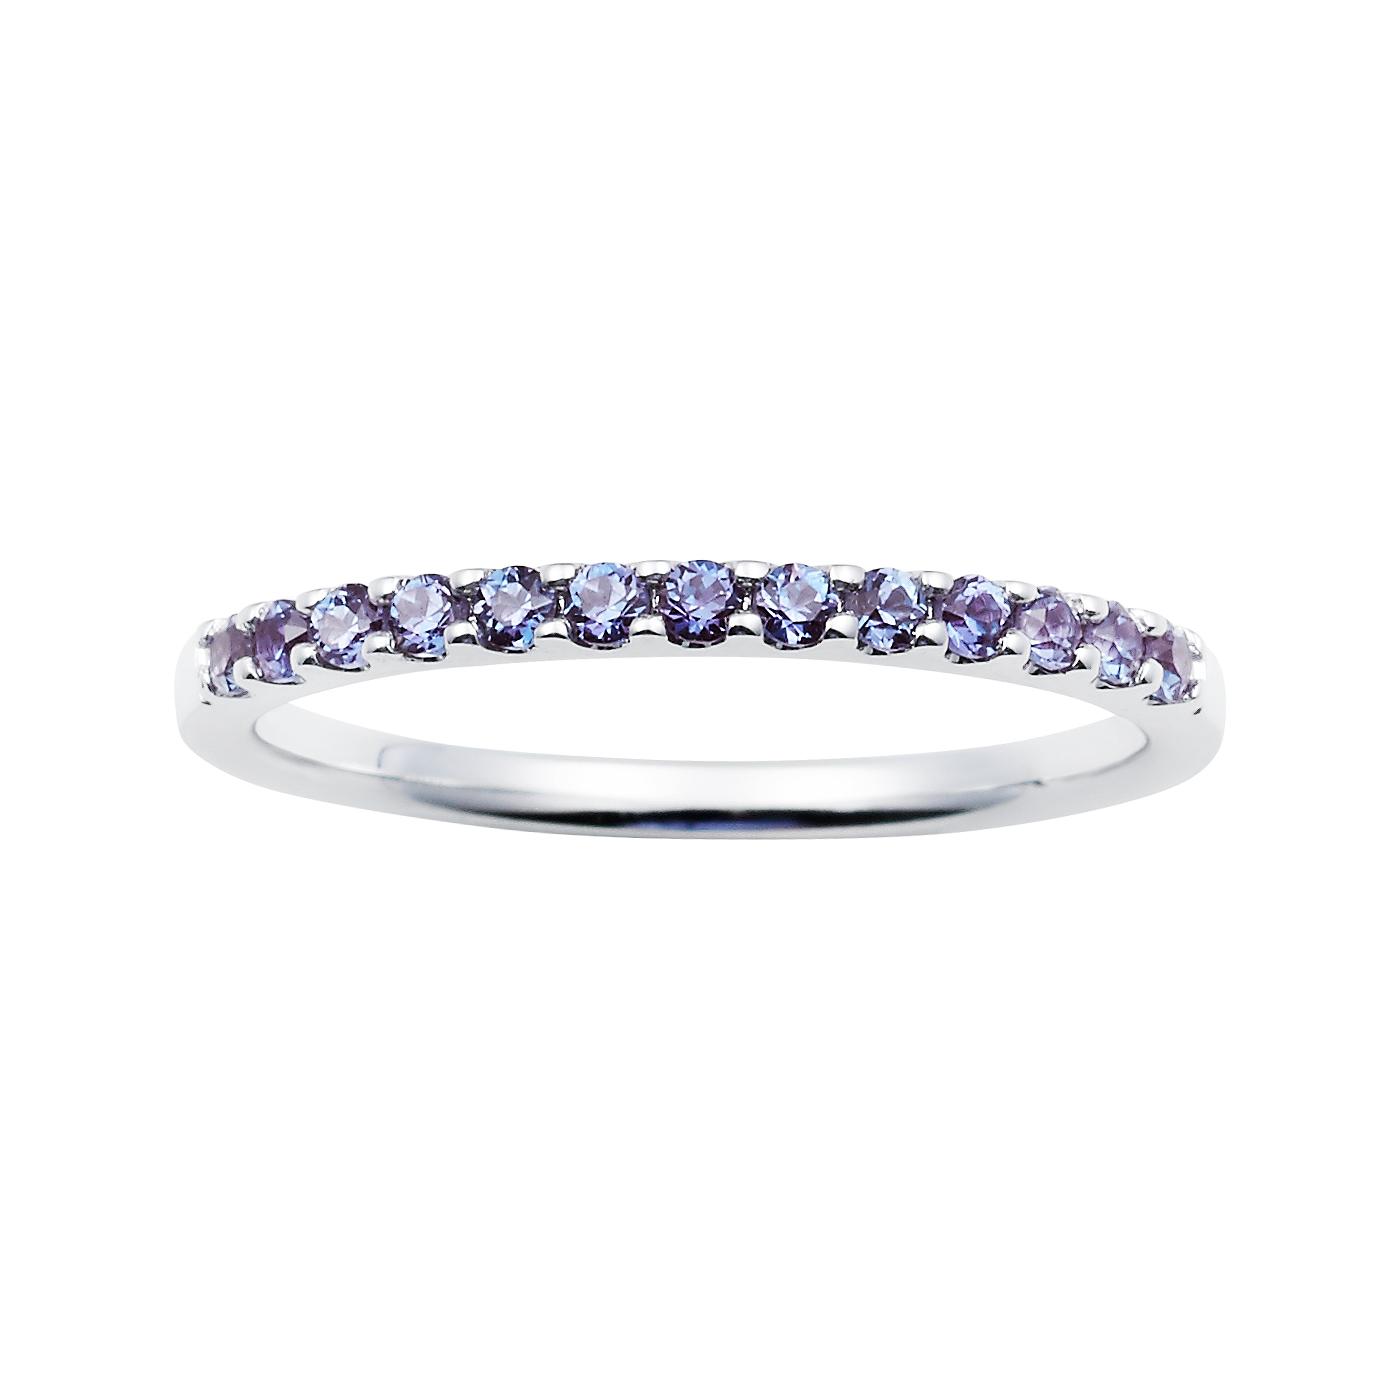 14K White Gold Created Alexandrite Gemstone Band Ring